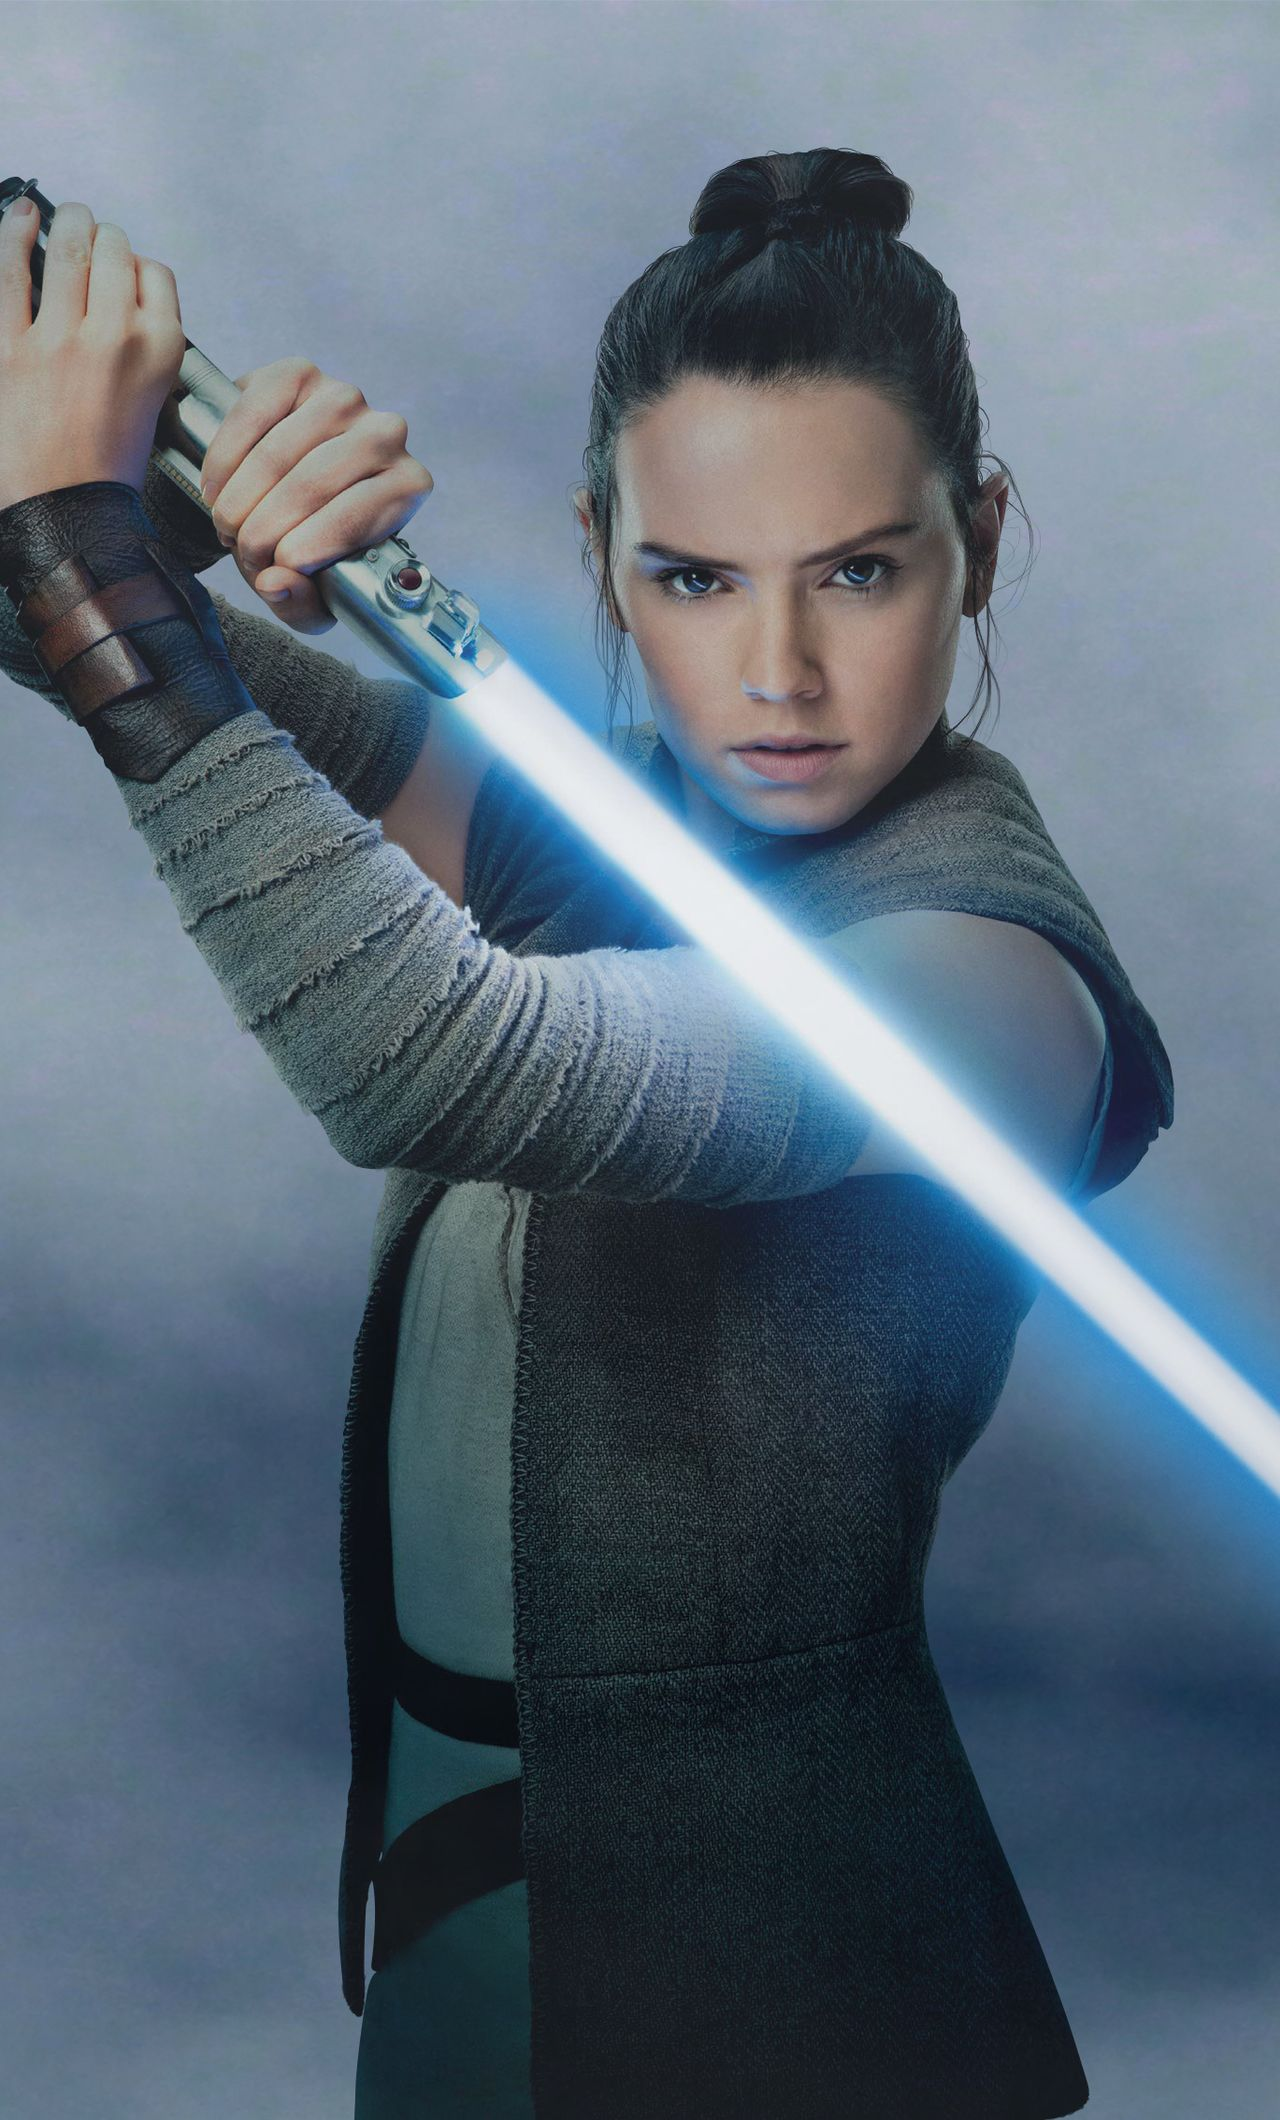 Poster For Star Wars The Last Jedi Rey Star Wars Star Wars Wallpaper Star Wars Images